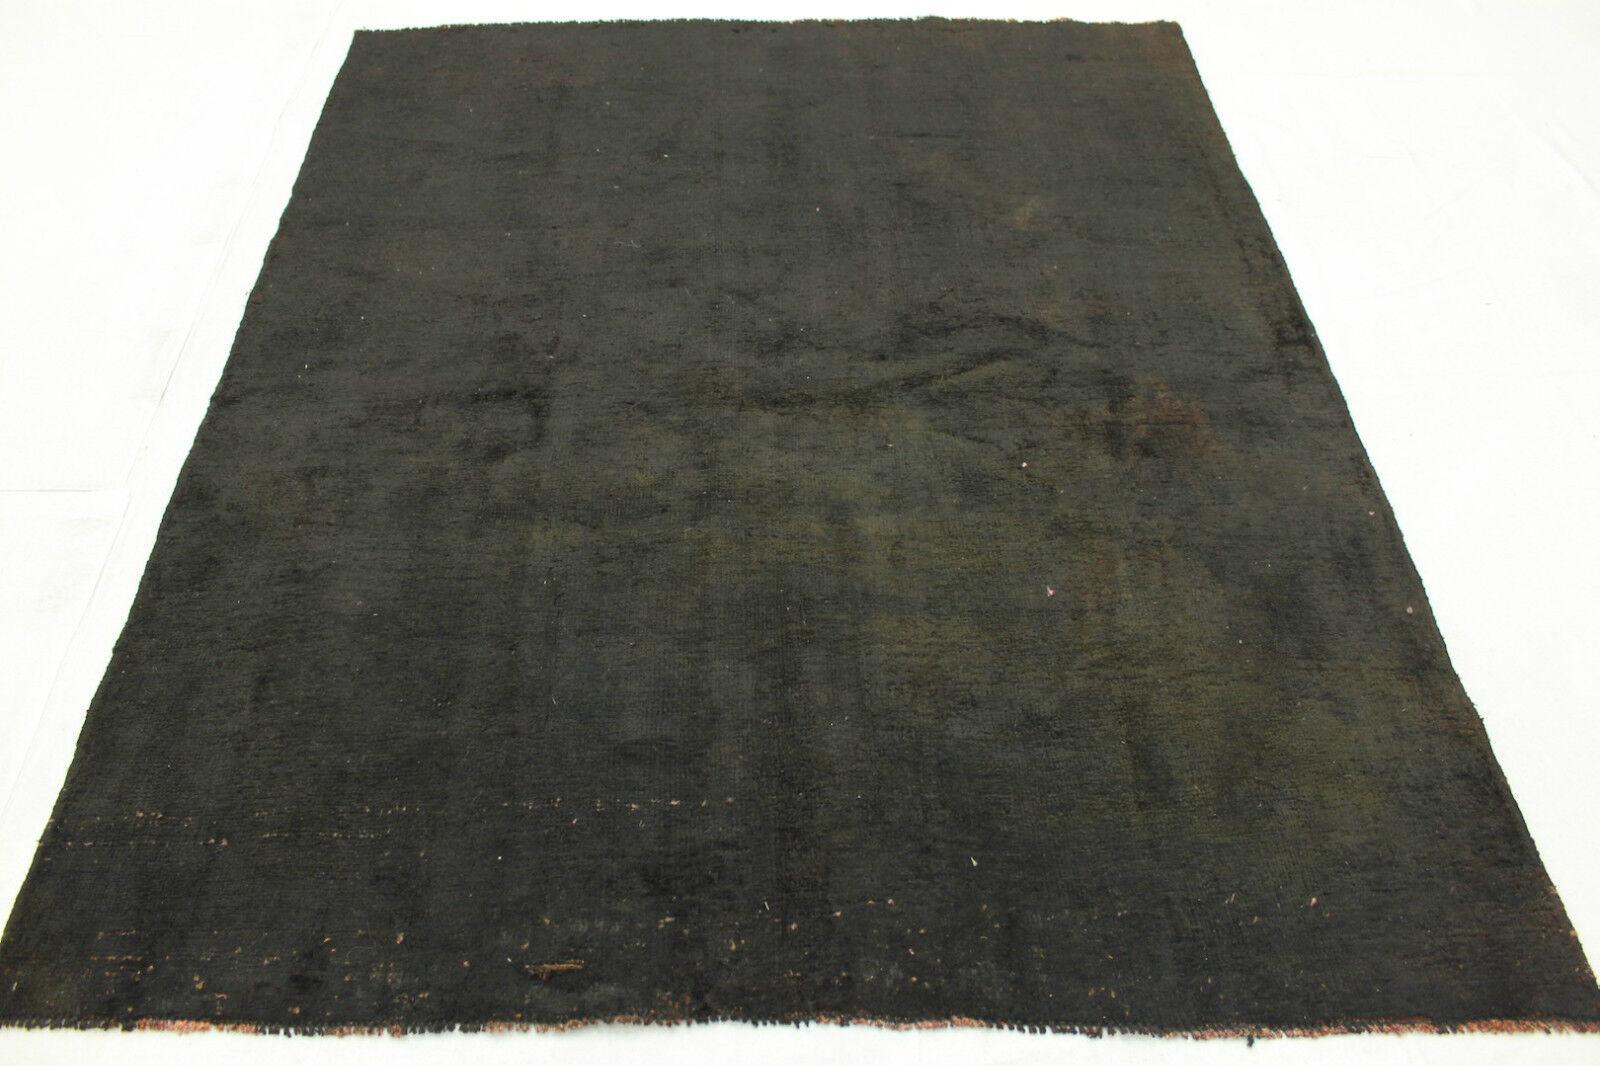 Vintage Orient alfombra negra 190x160 look usado hecha decorativo 2833